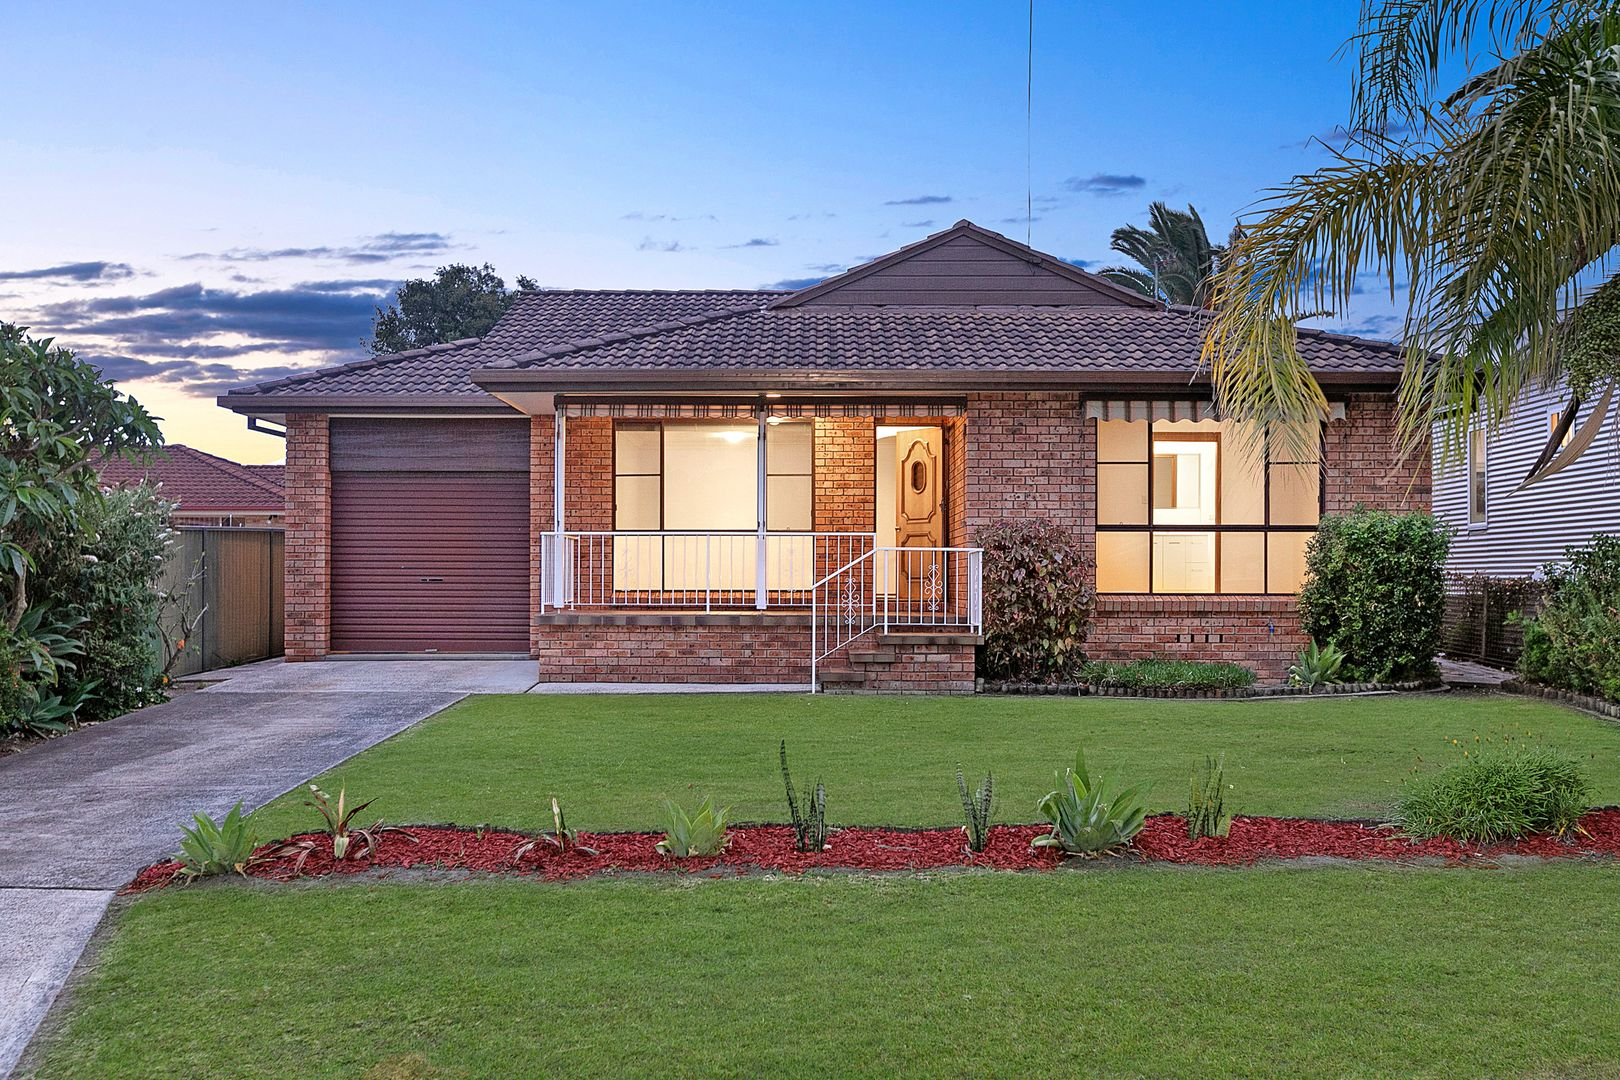 34 Macarthur Street, Killarney Vale NSW 2261, Image 0